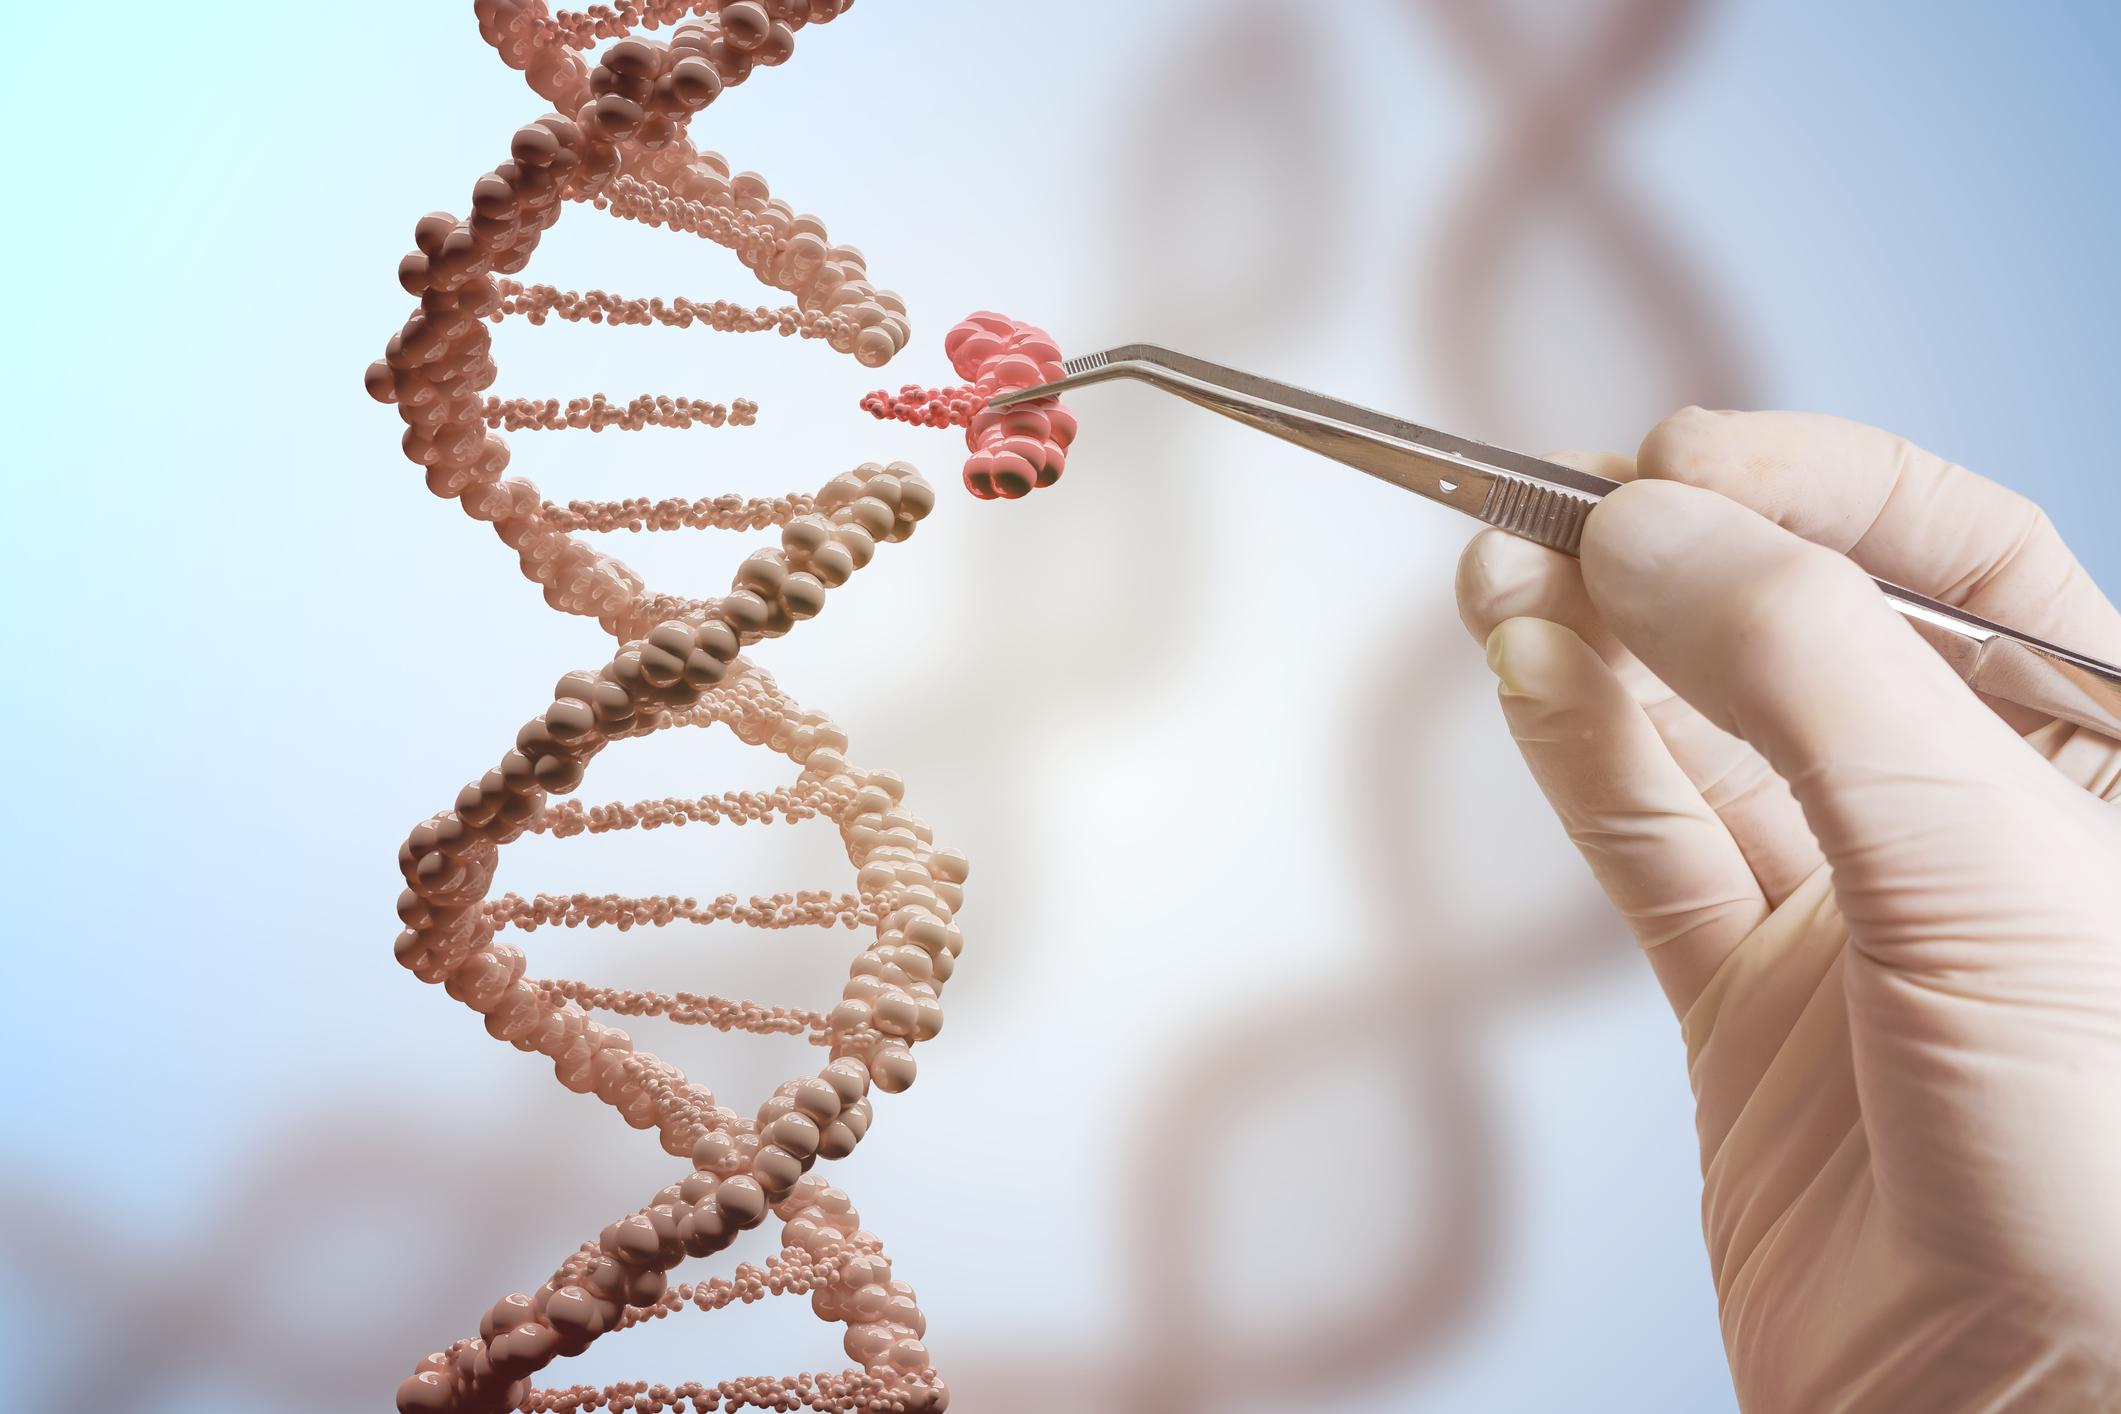 Why CRISPR Therapeutics Stock Sank Today